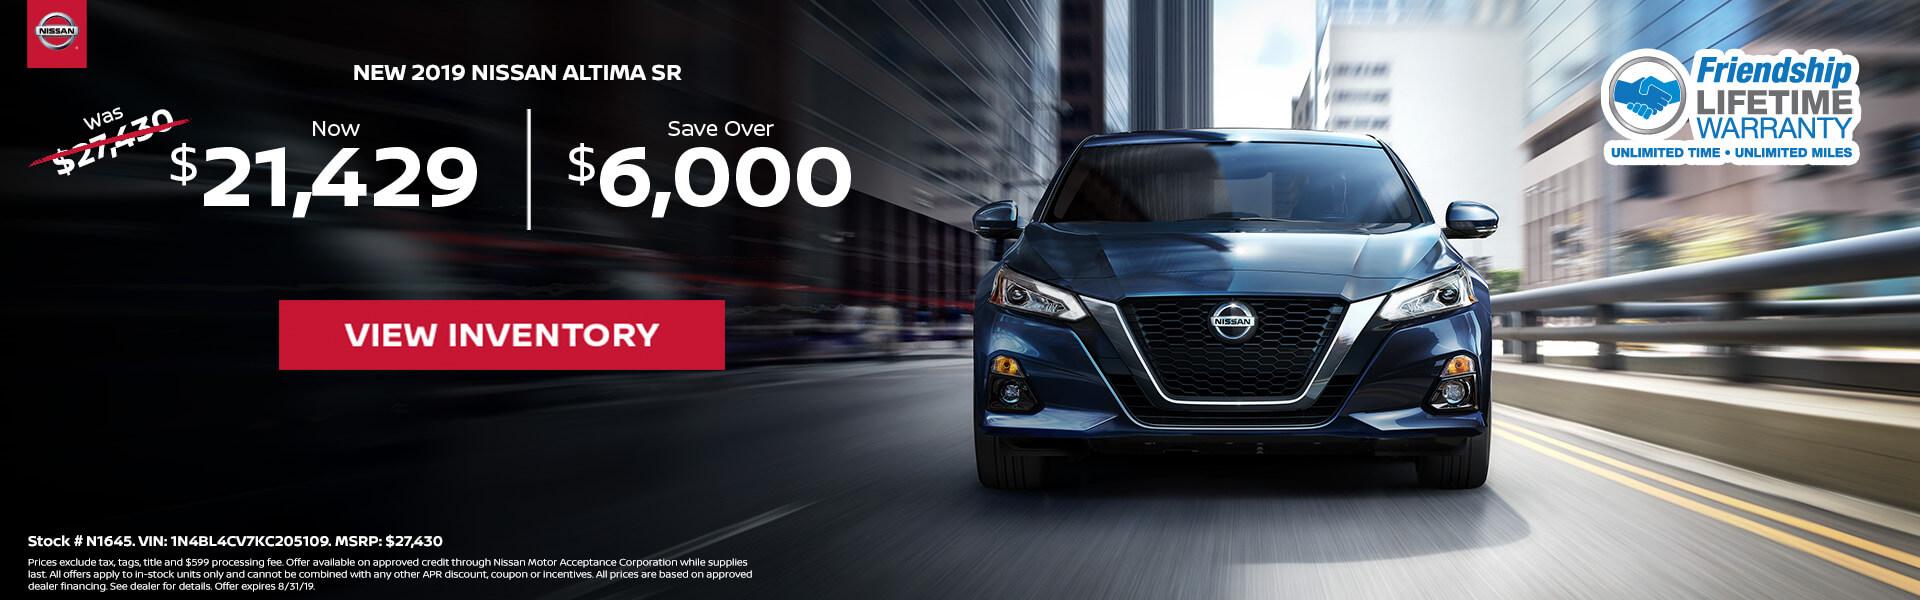 Nissan Altima $21,429 Purchase